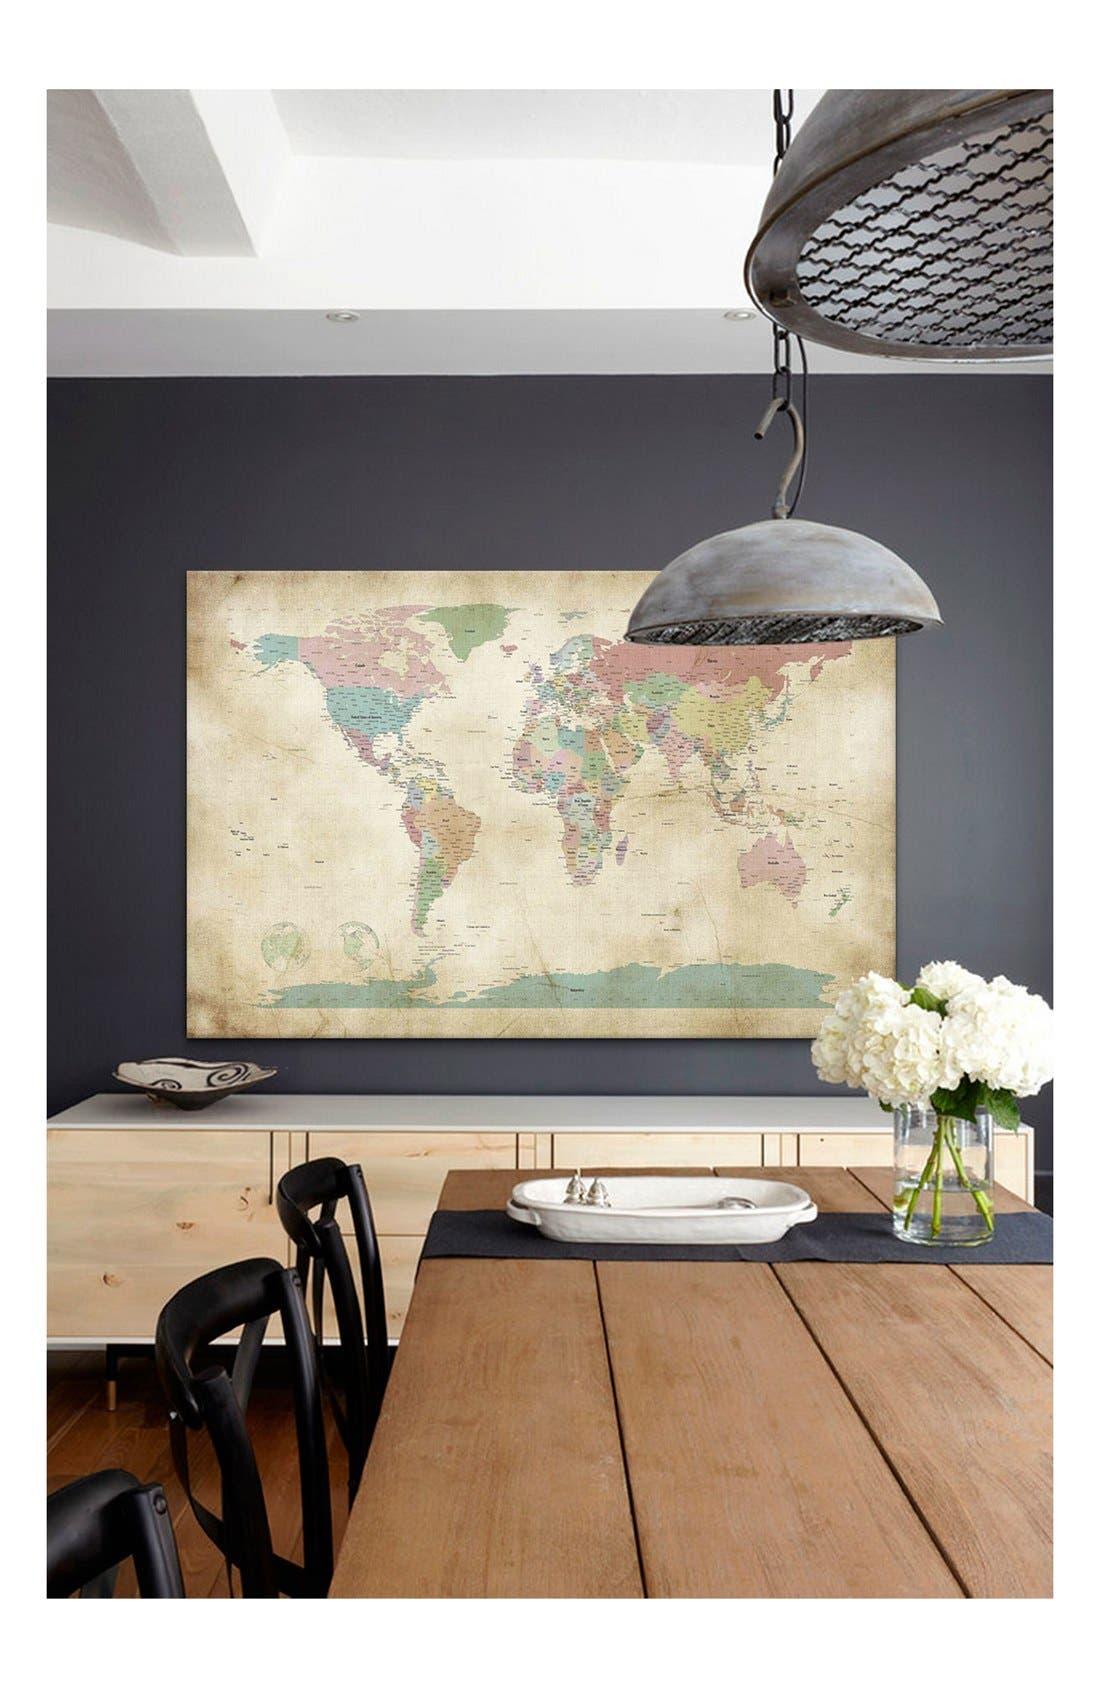 'World Cities Map - Michael Thompsett' Giclée Print Canvas Art,                             Alternate thumbnail 2, color,                             BROWN/ MULTI